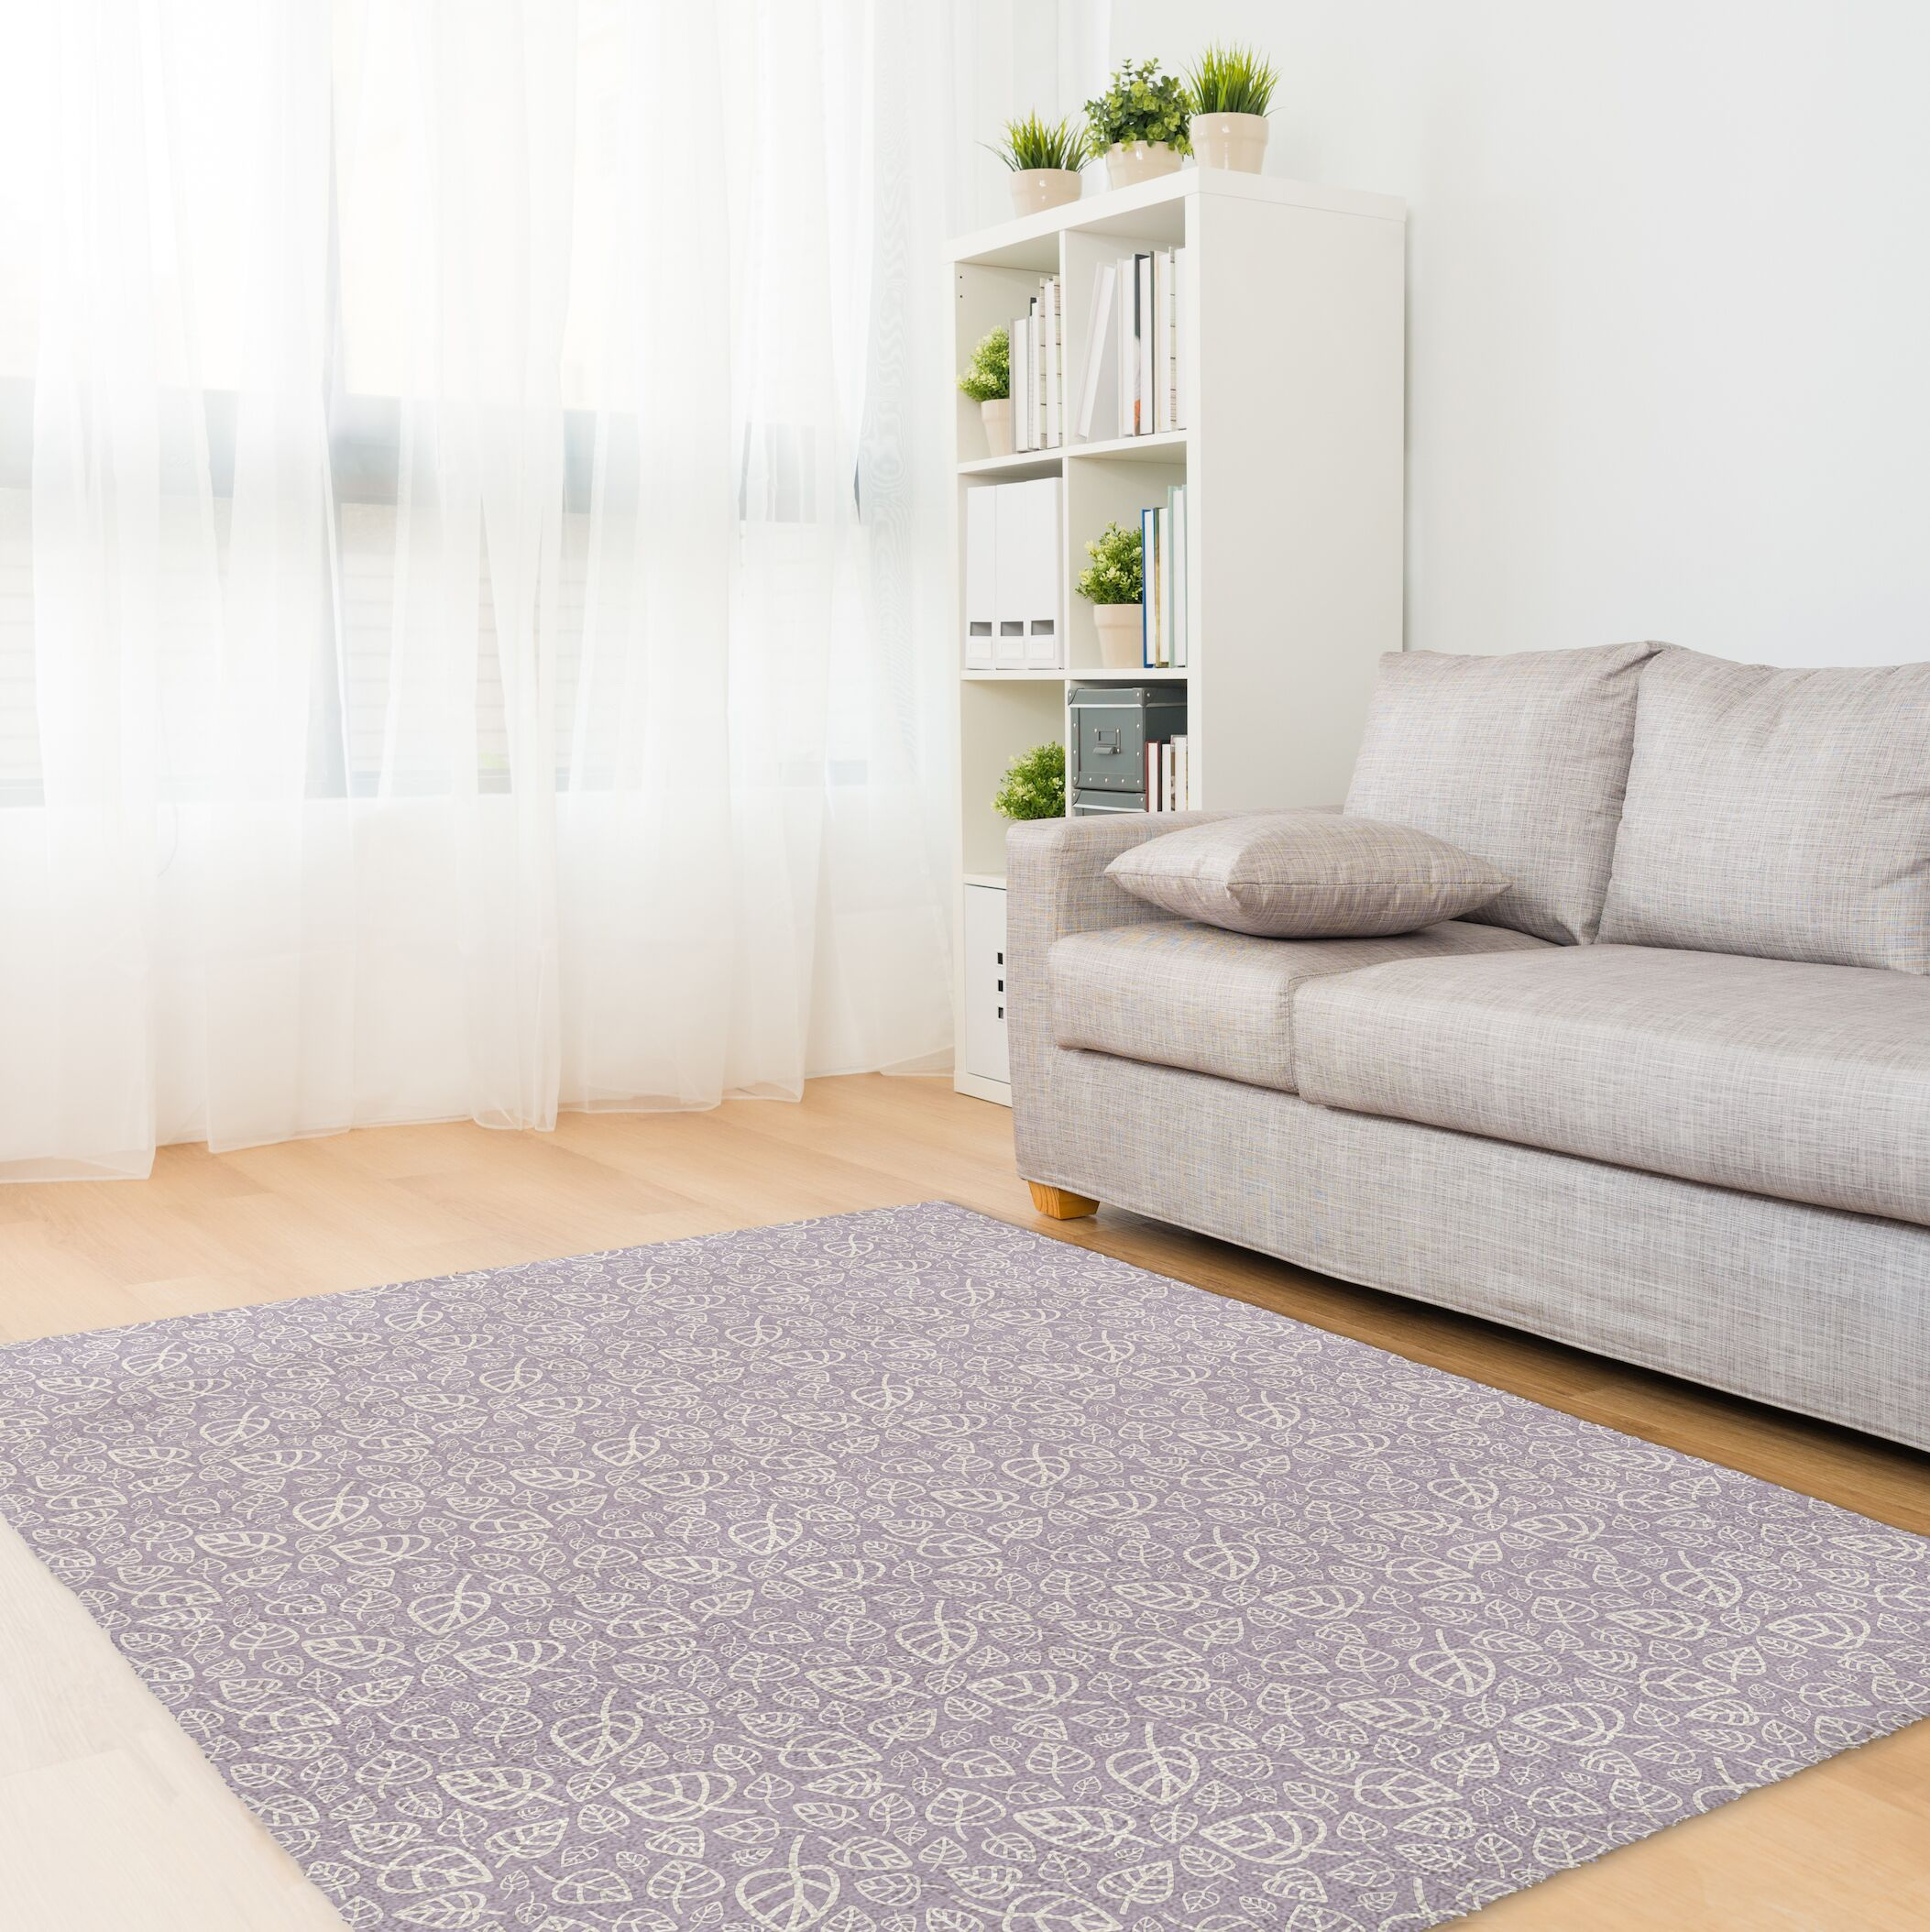 Decarlo Purple Area Rug Rug Size: Rectangle 5' x 7'